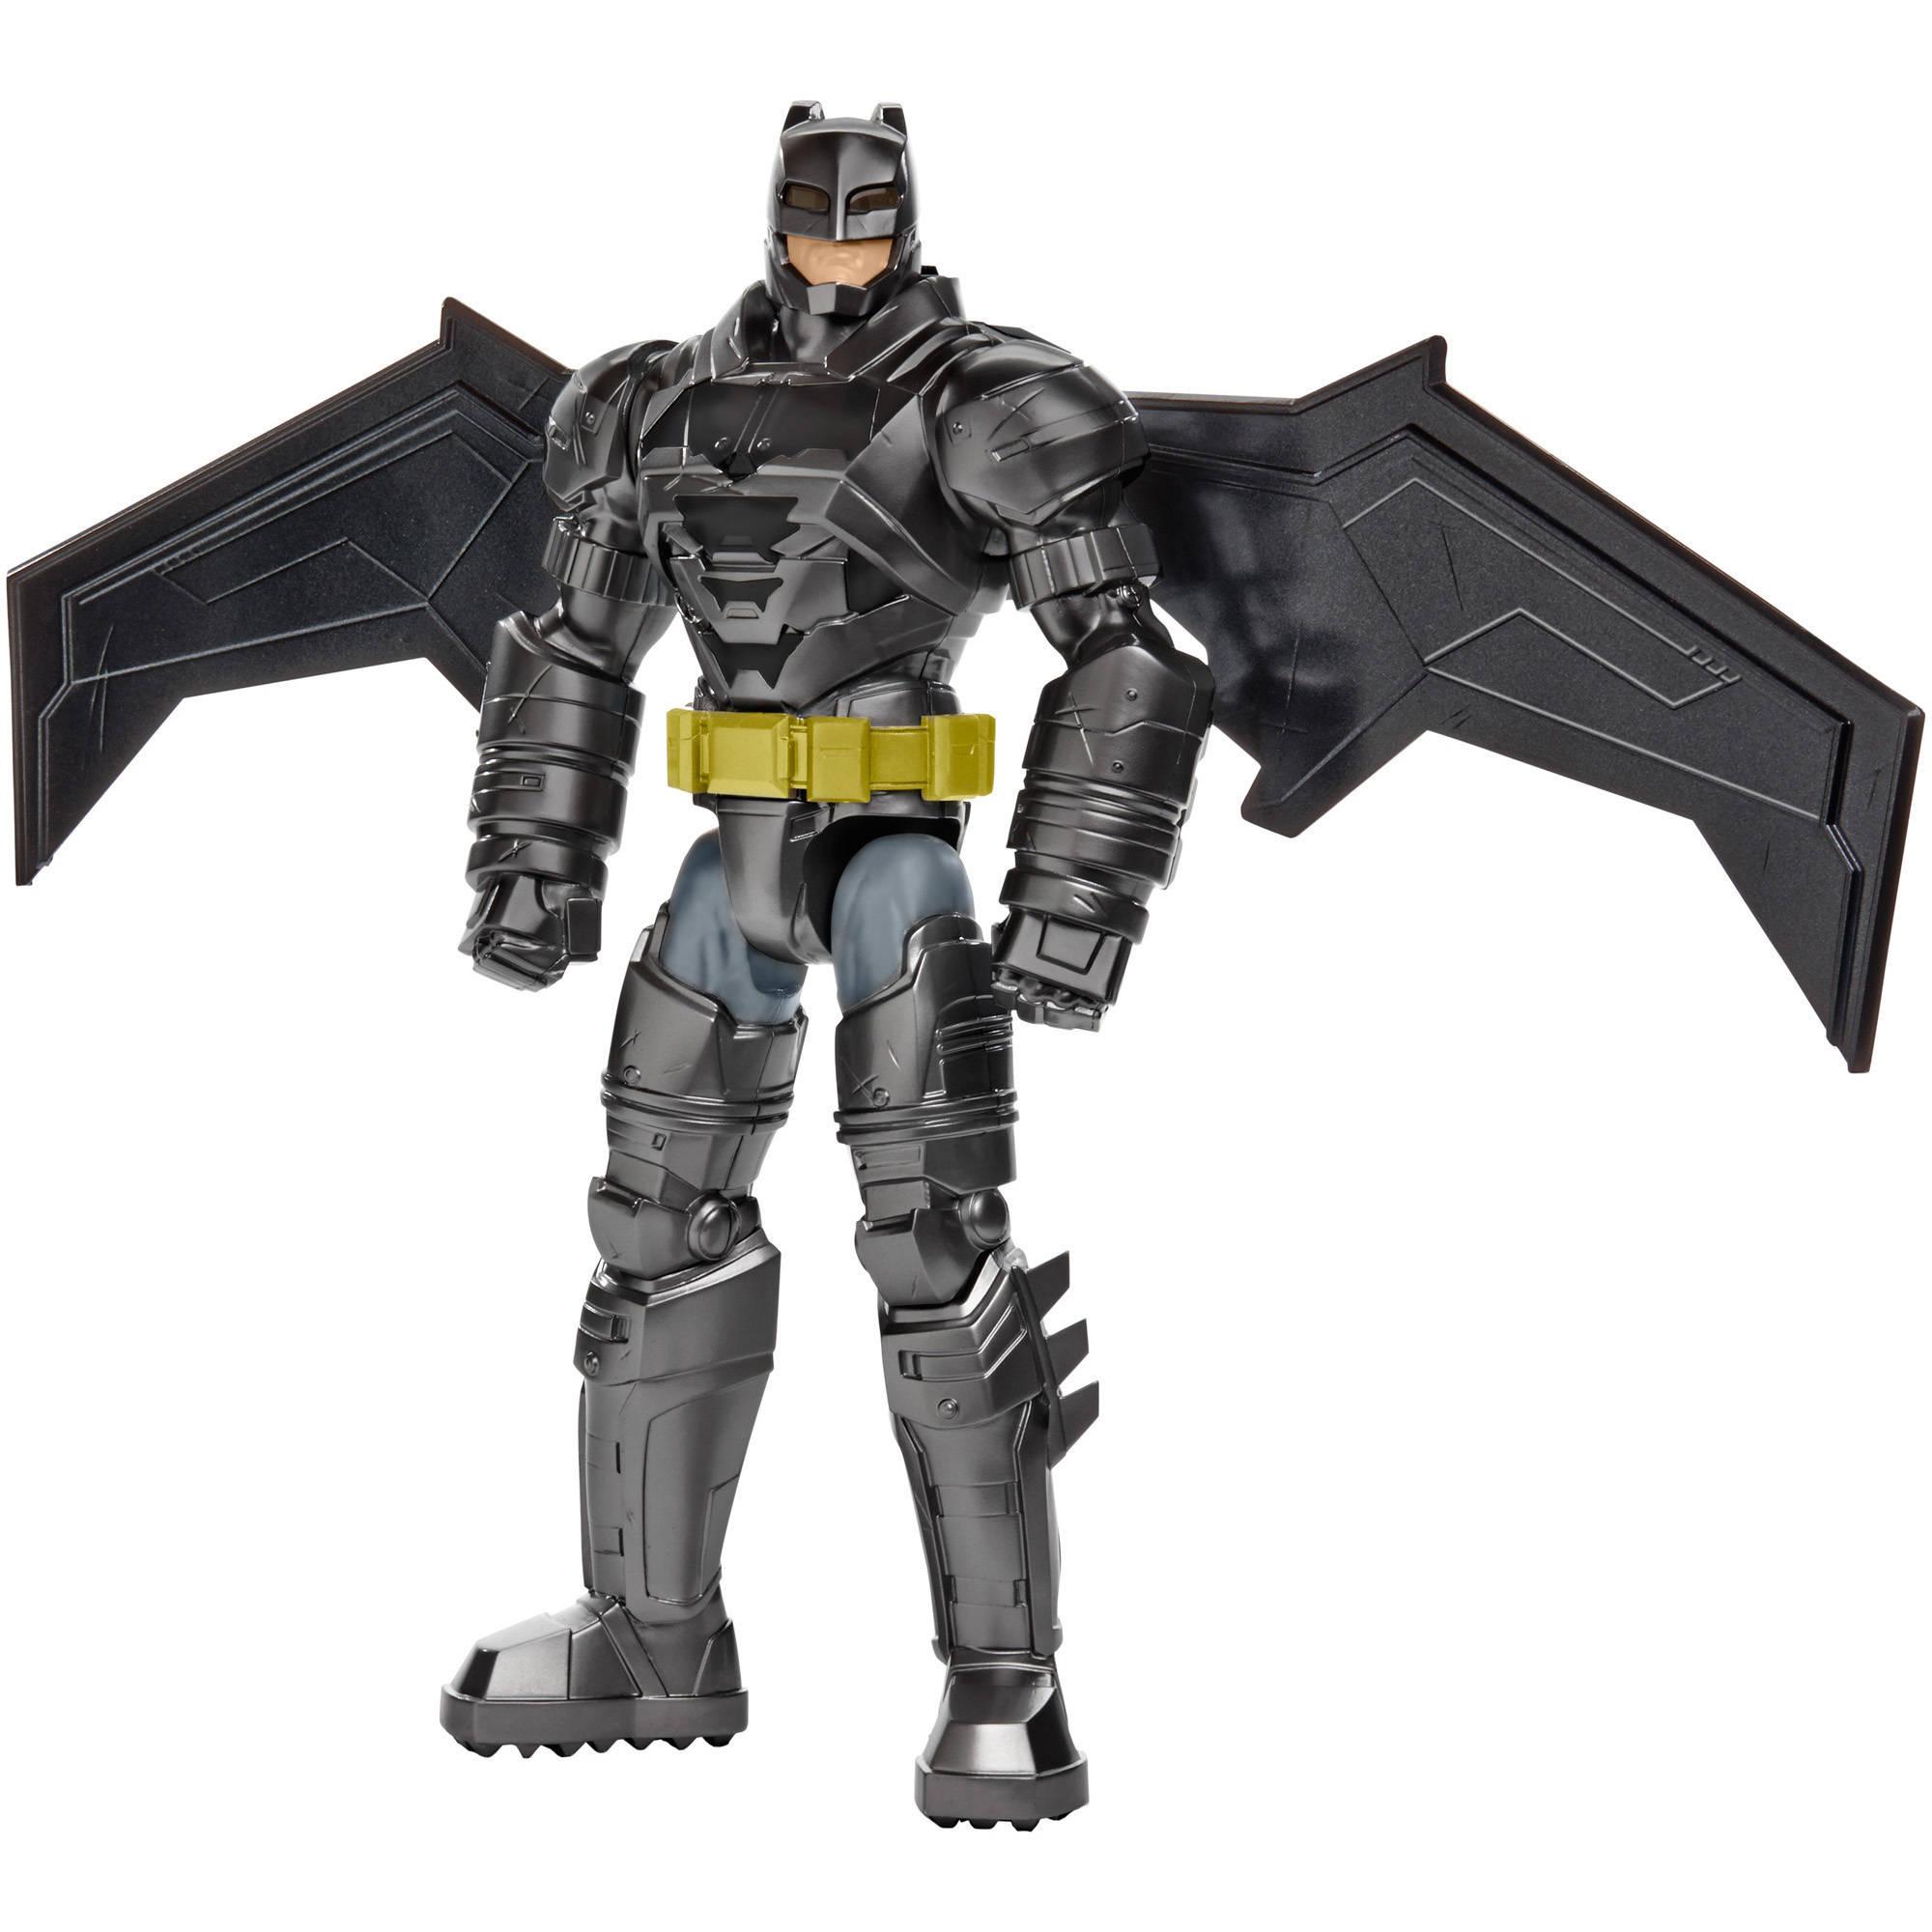 Batman V Superman: Dawn Of Justice Electro-Armor Batman Figure